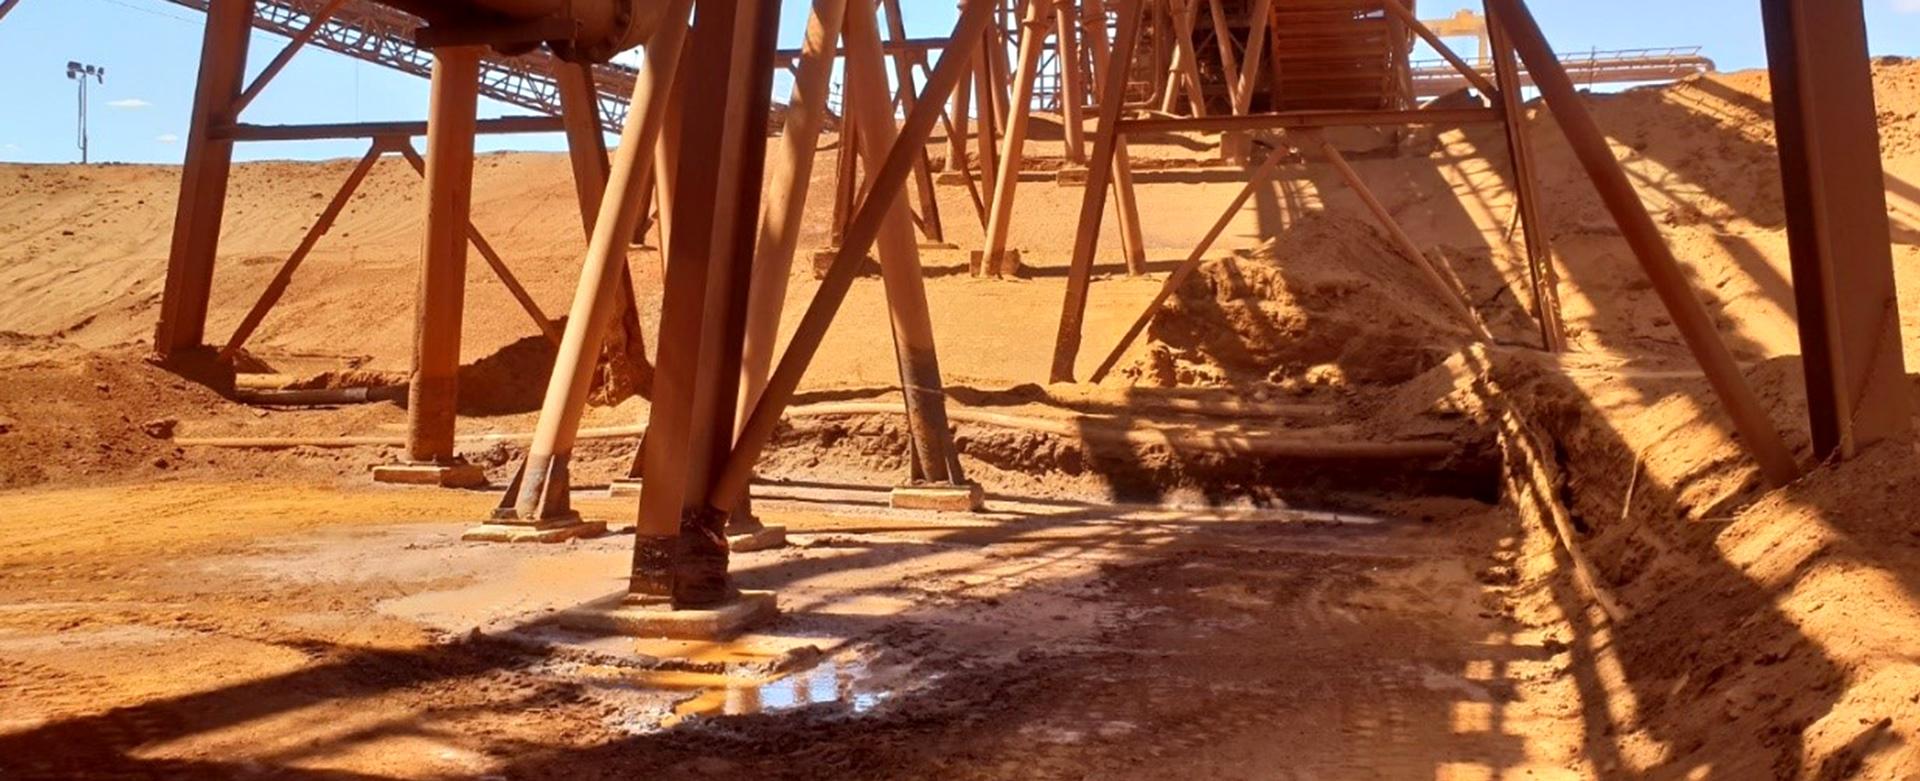 Warrikal Engineering Civil Works Civil Construction Services